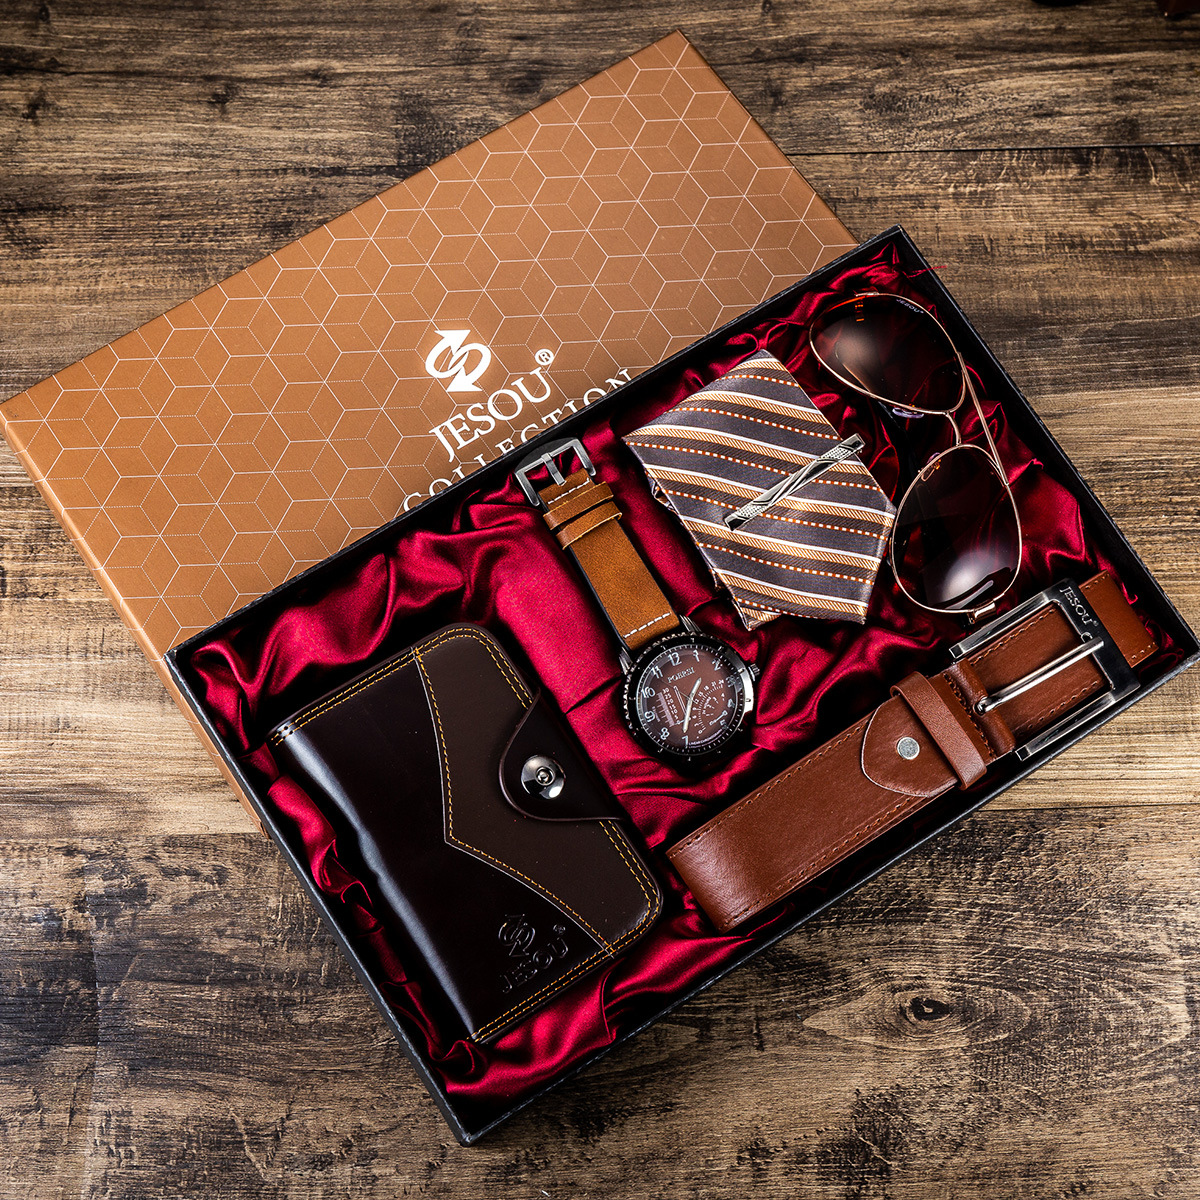 6pcs/set Men's Gift Set Beautifully Packaged Watches+glasses Belt Wallet Creative Fashion Male Quartz Watch For Men Clock Hours